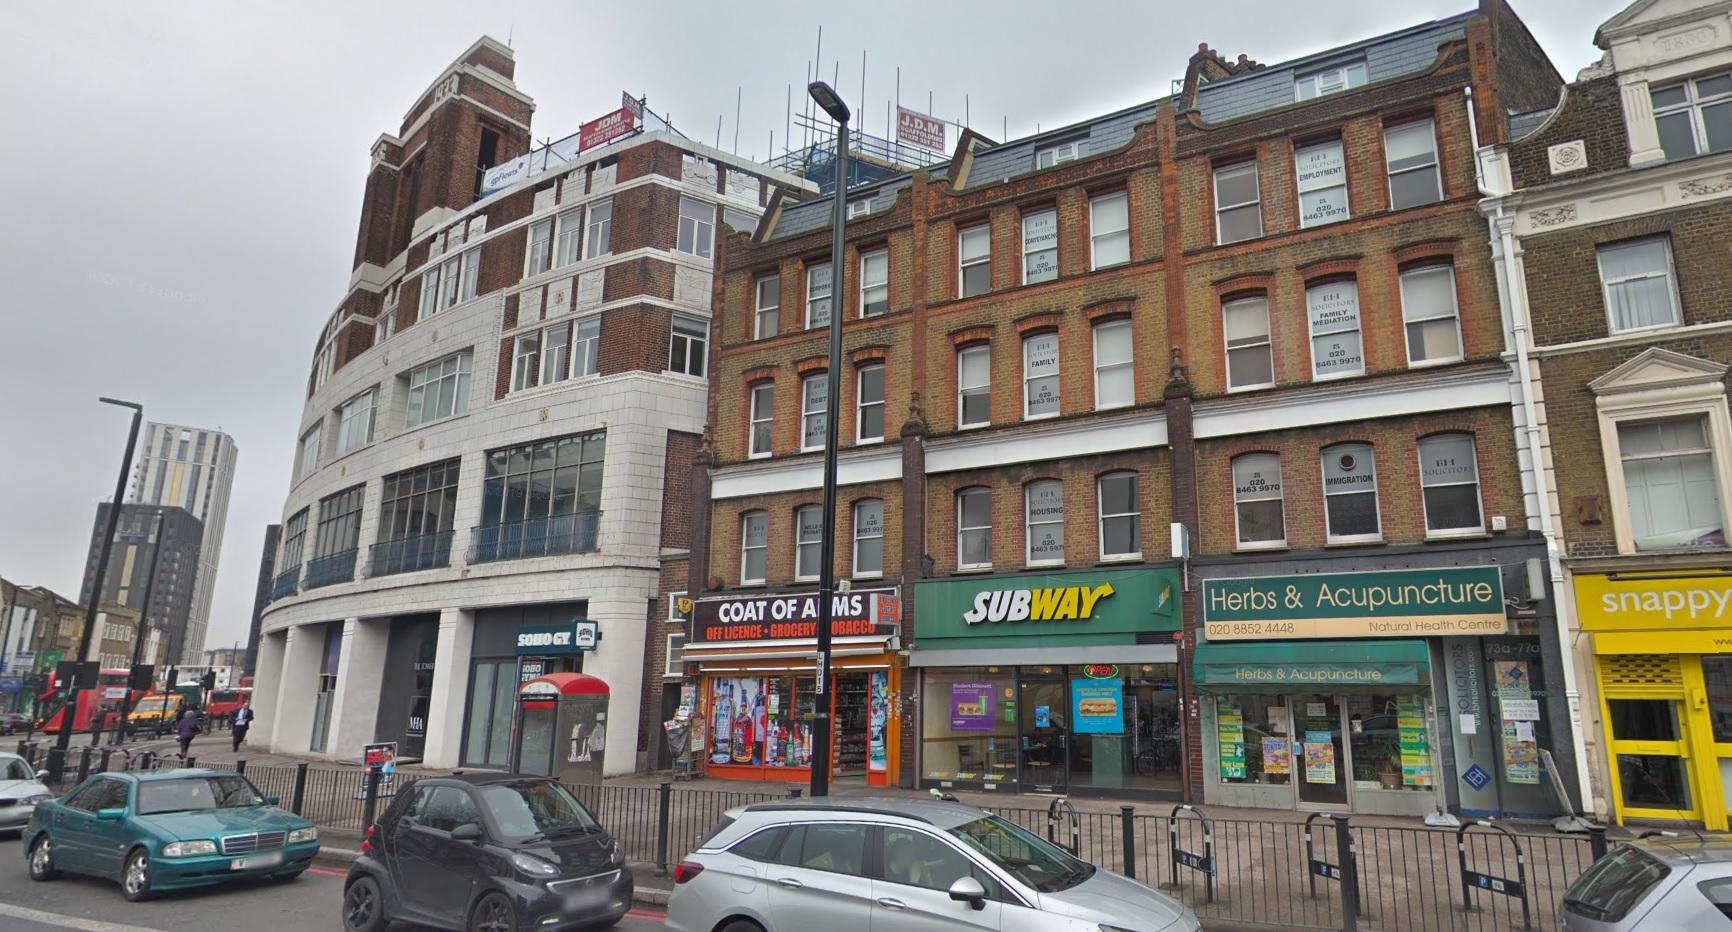 Plan to convert Lewisham High Street building's upper floors into 24 flats